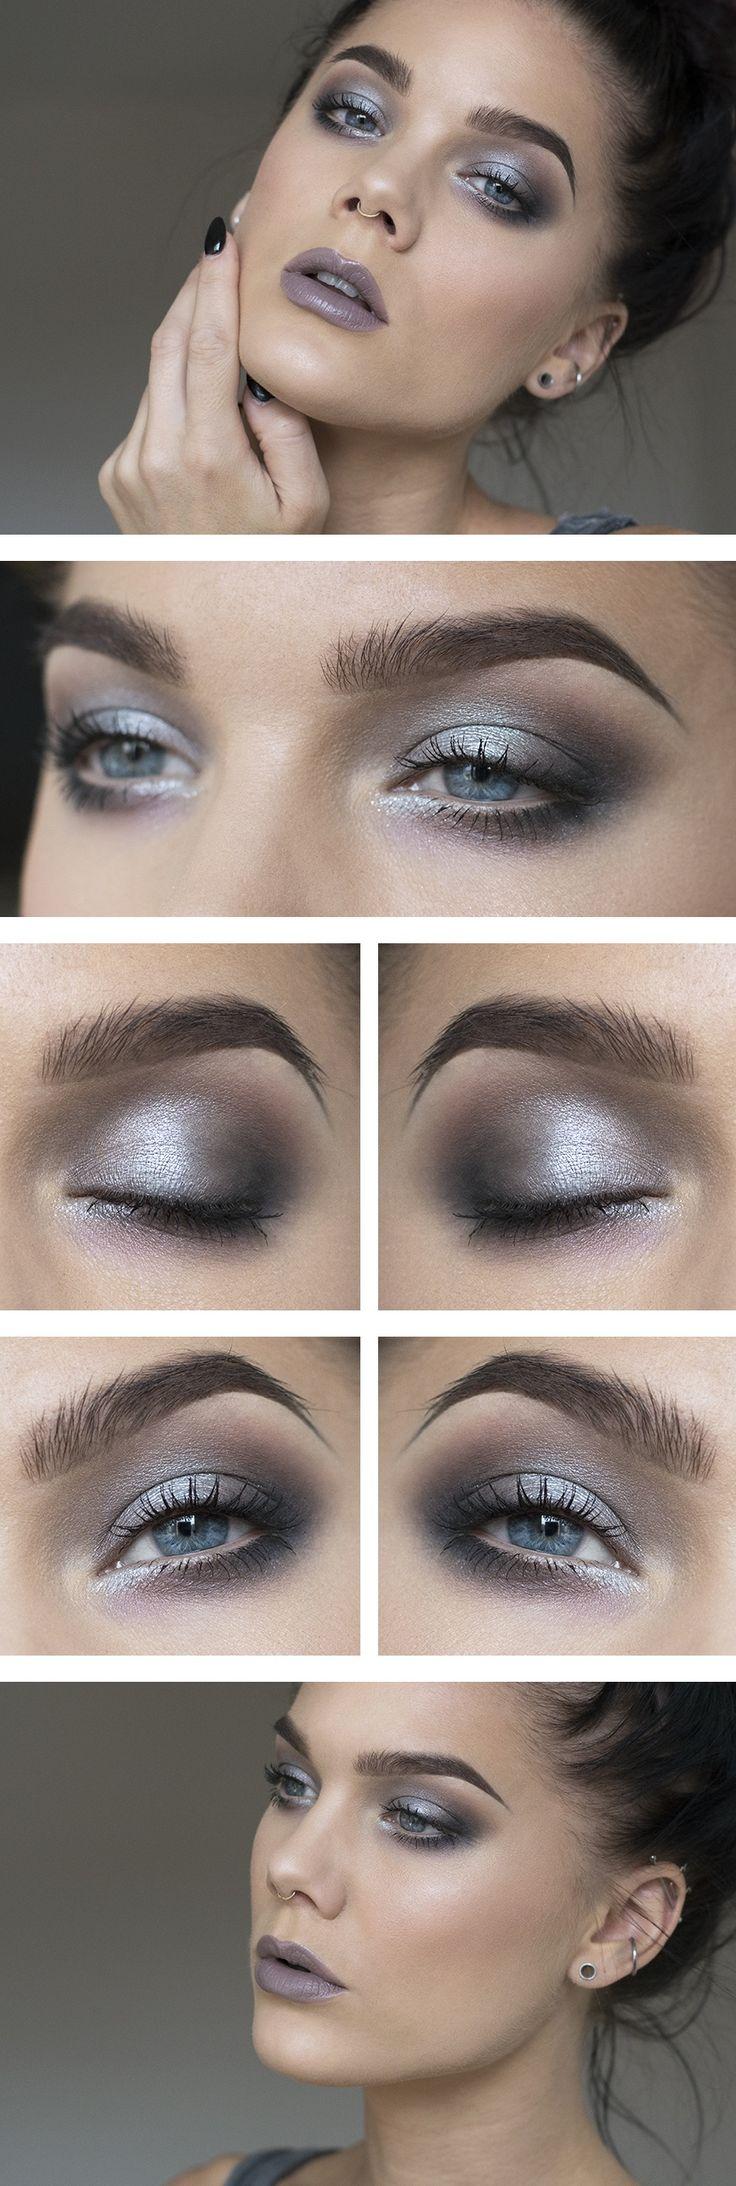 Today's look – Pastel grey. Grey makeup generally looks nice on people with dark features- dark hair, eyes or skin tone.